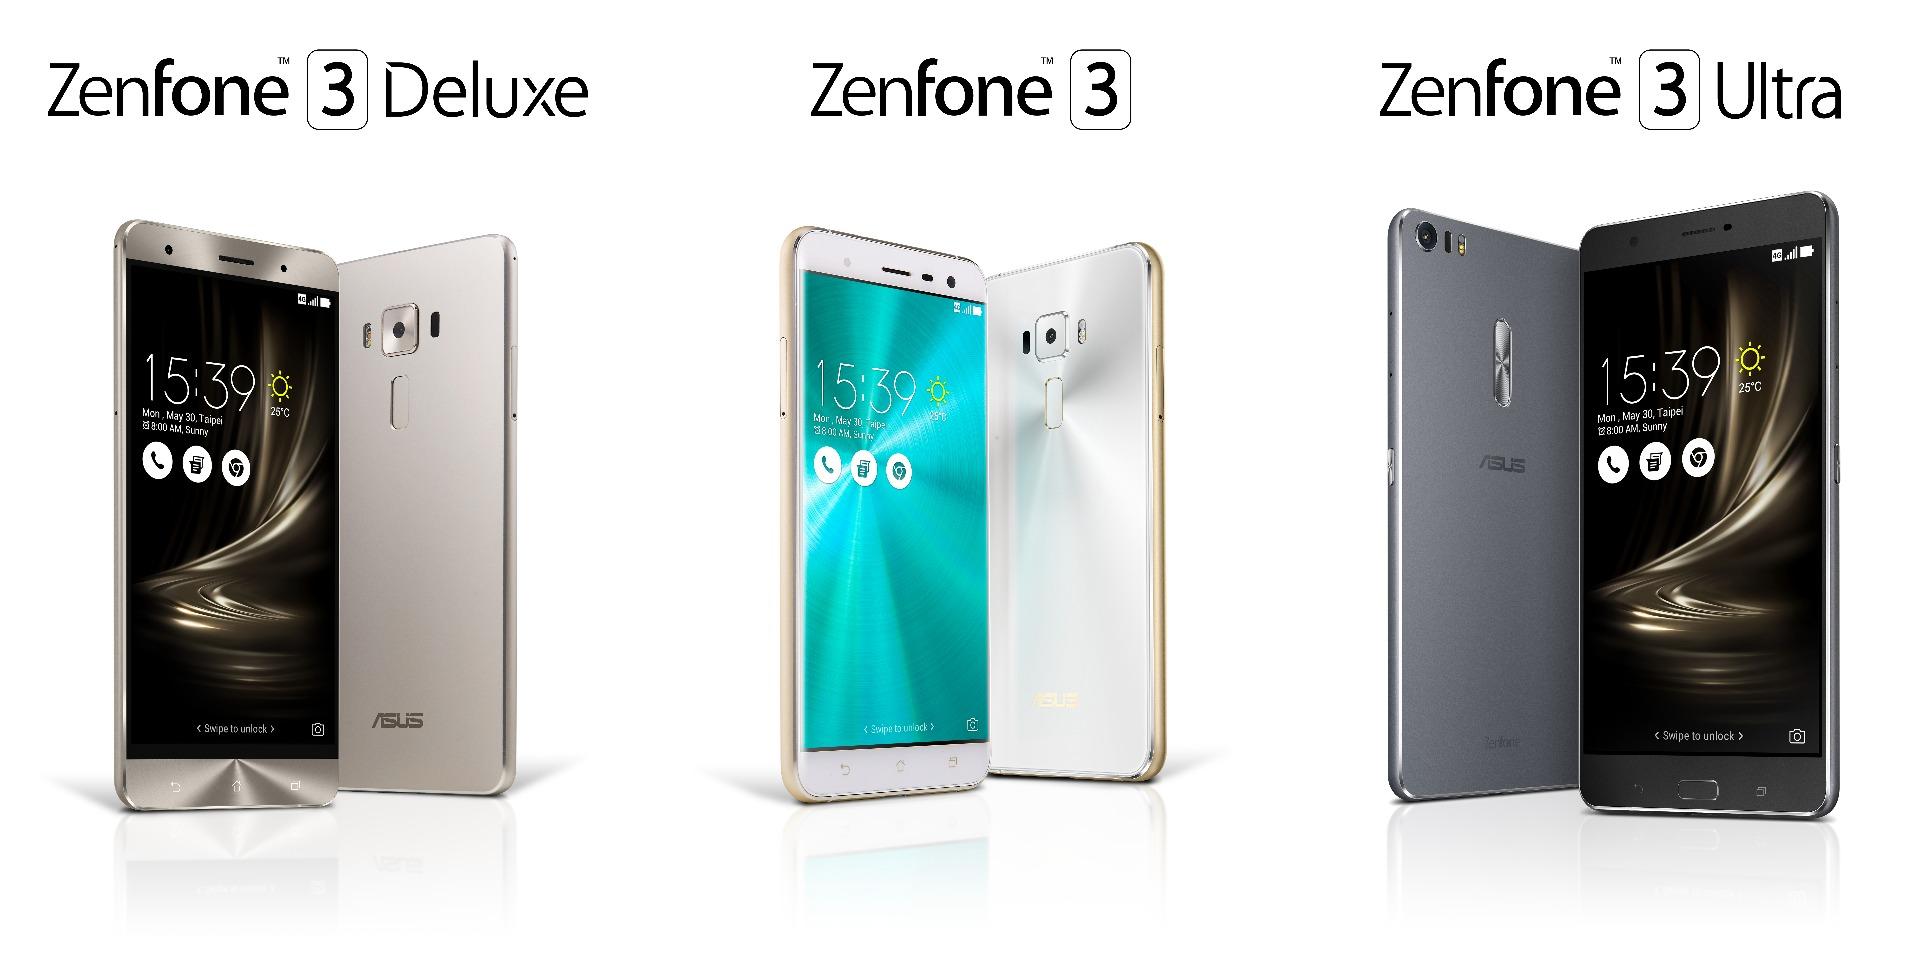 ZenFone 3 / Deluxe / Ultra登場。価格は249ドルから、6GB RAM/ガラスボディ/指紋認証など